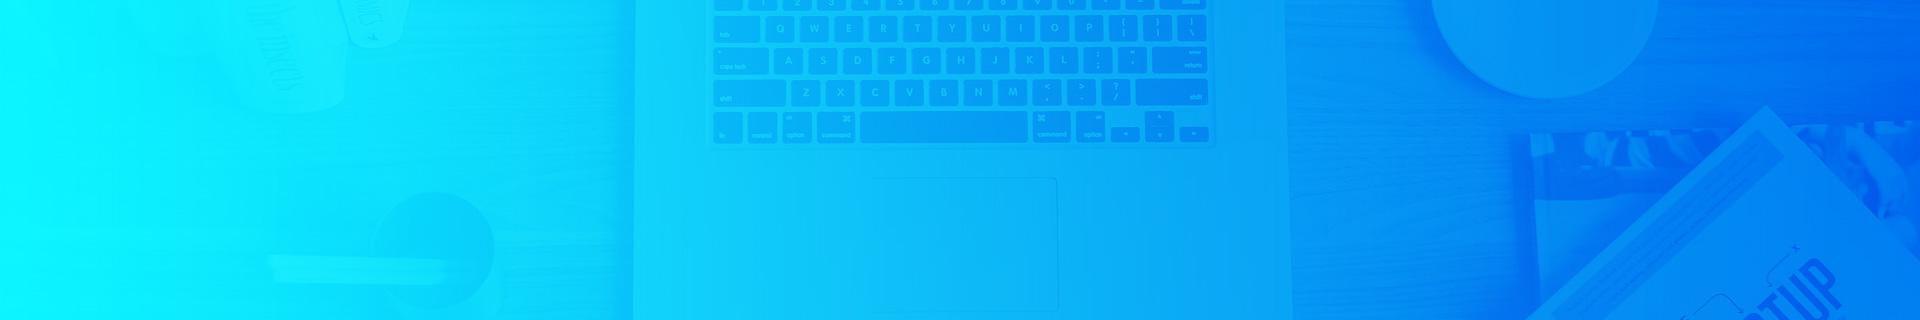 CSS3实例